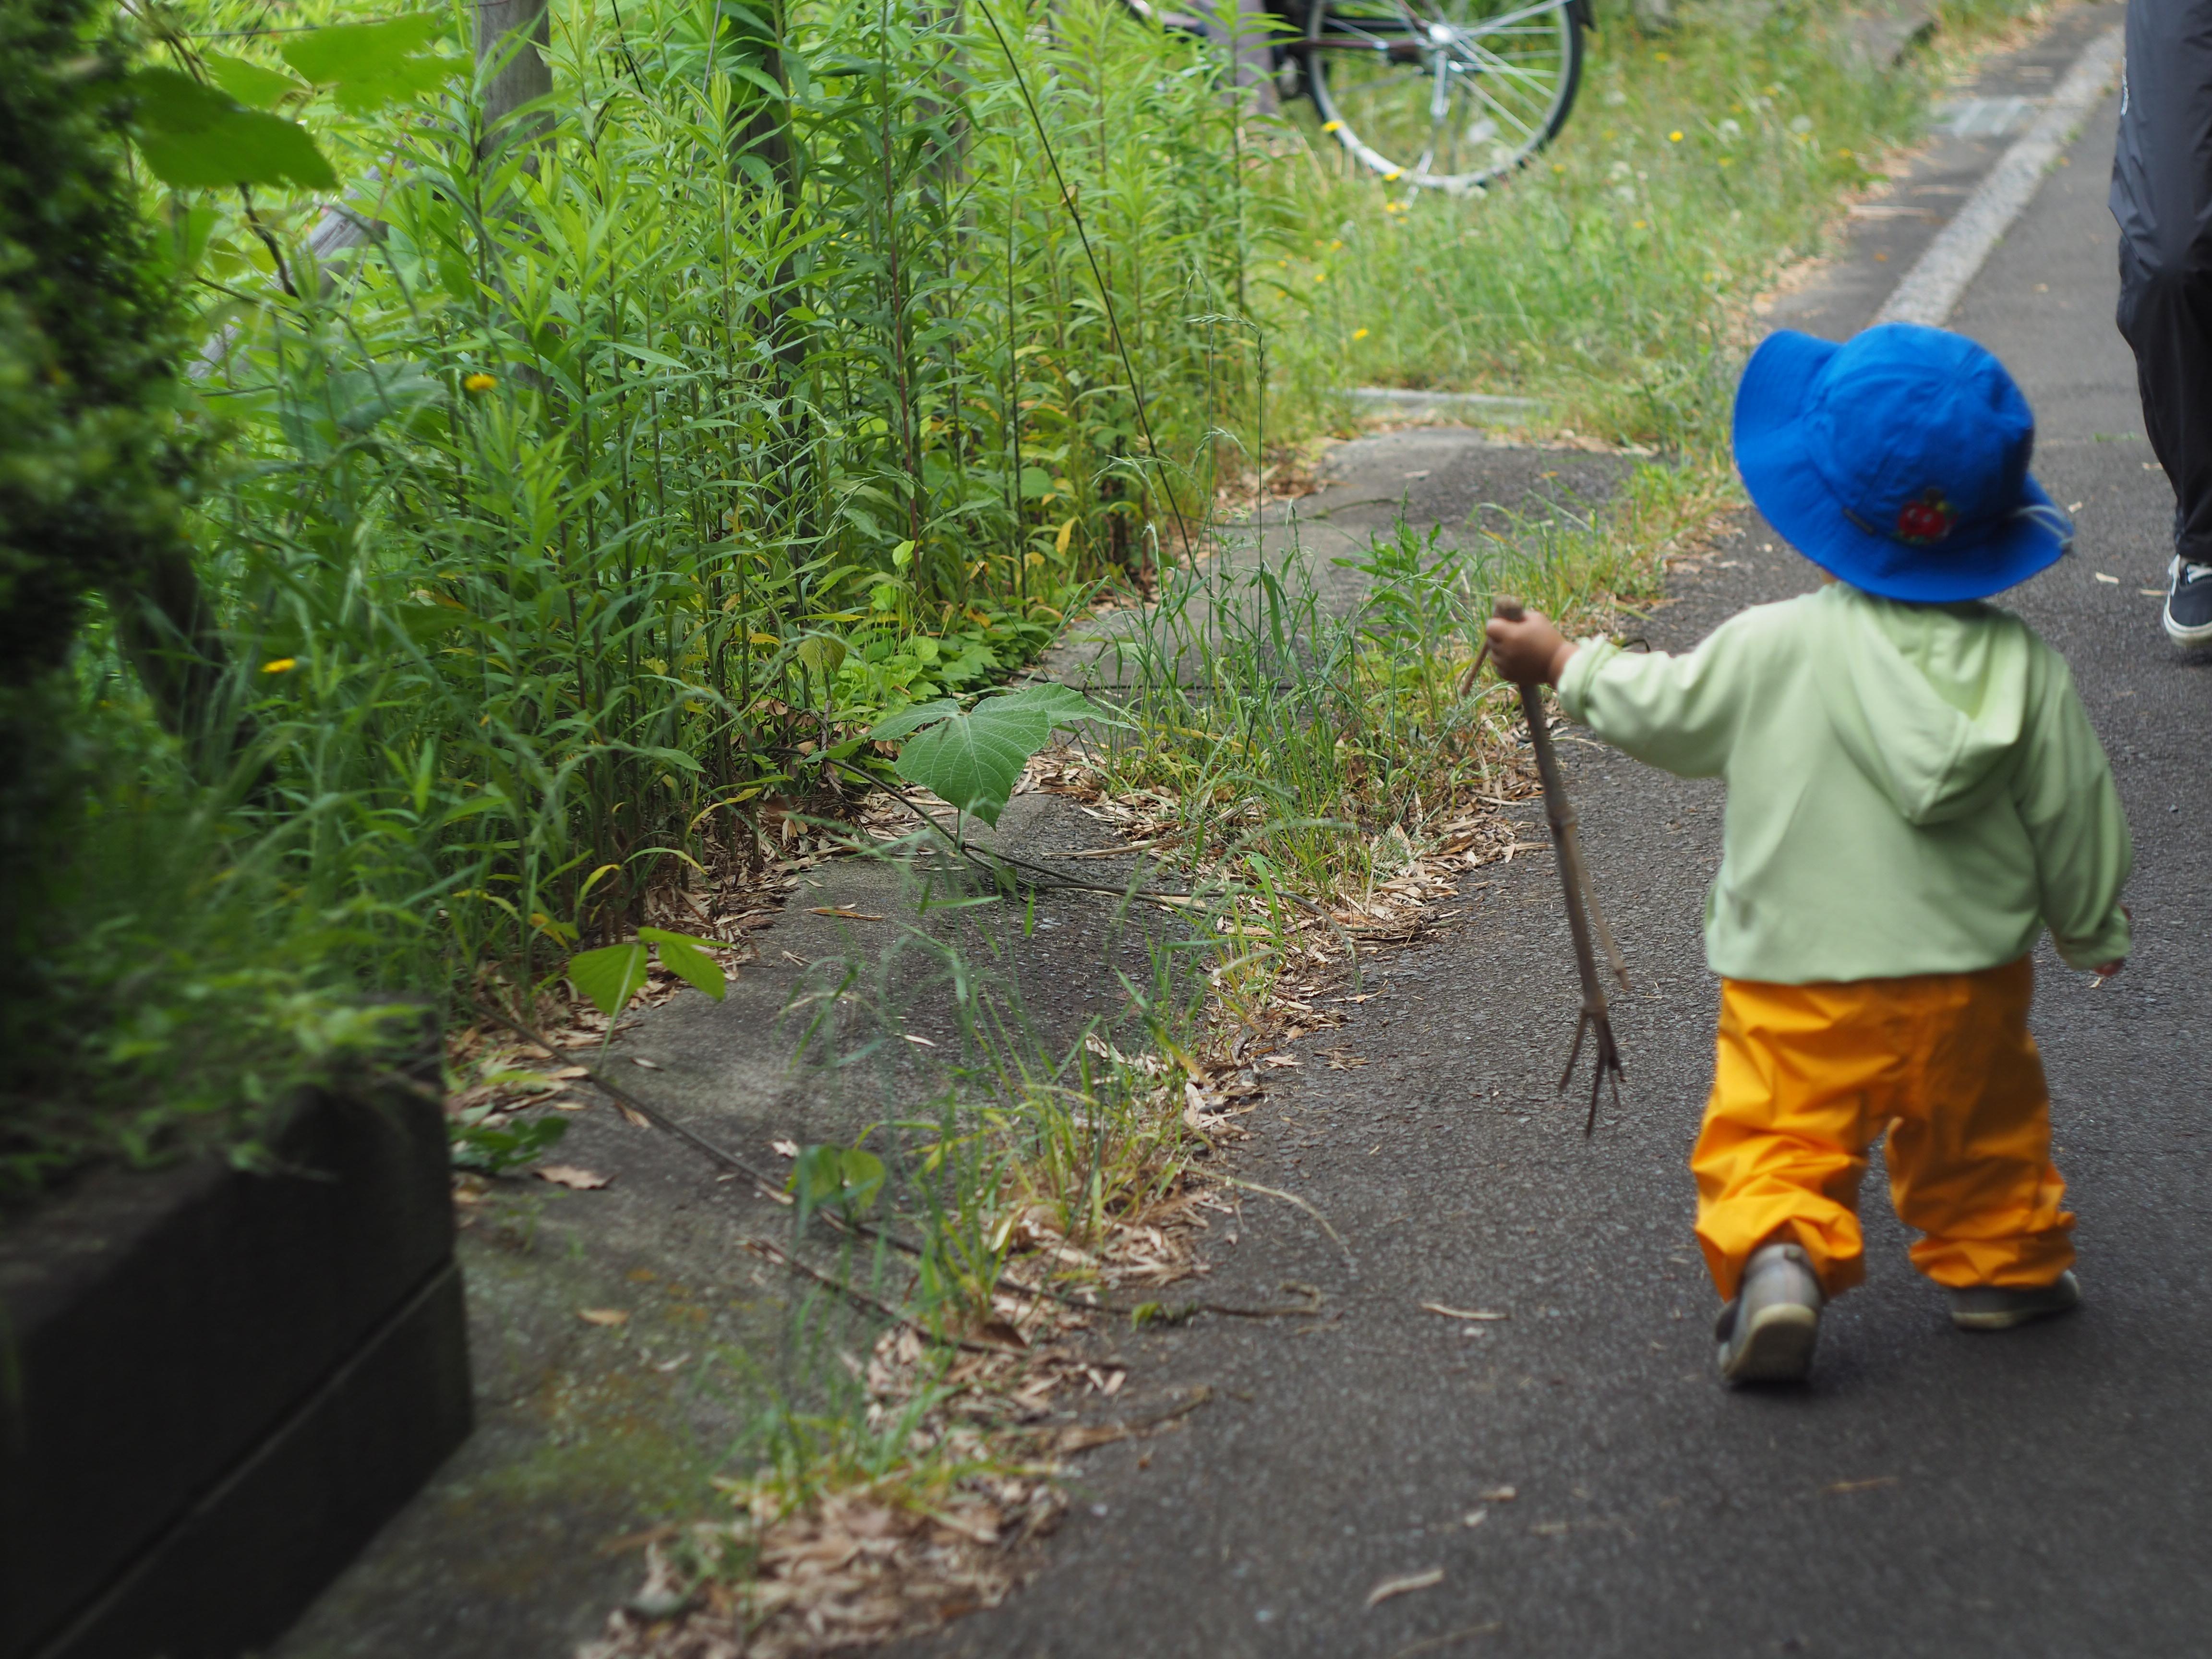 【2021年度パートスタッフ募集!】神奈川県横浜市神奈川区羽沢 小規模保育室